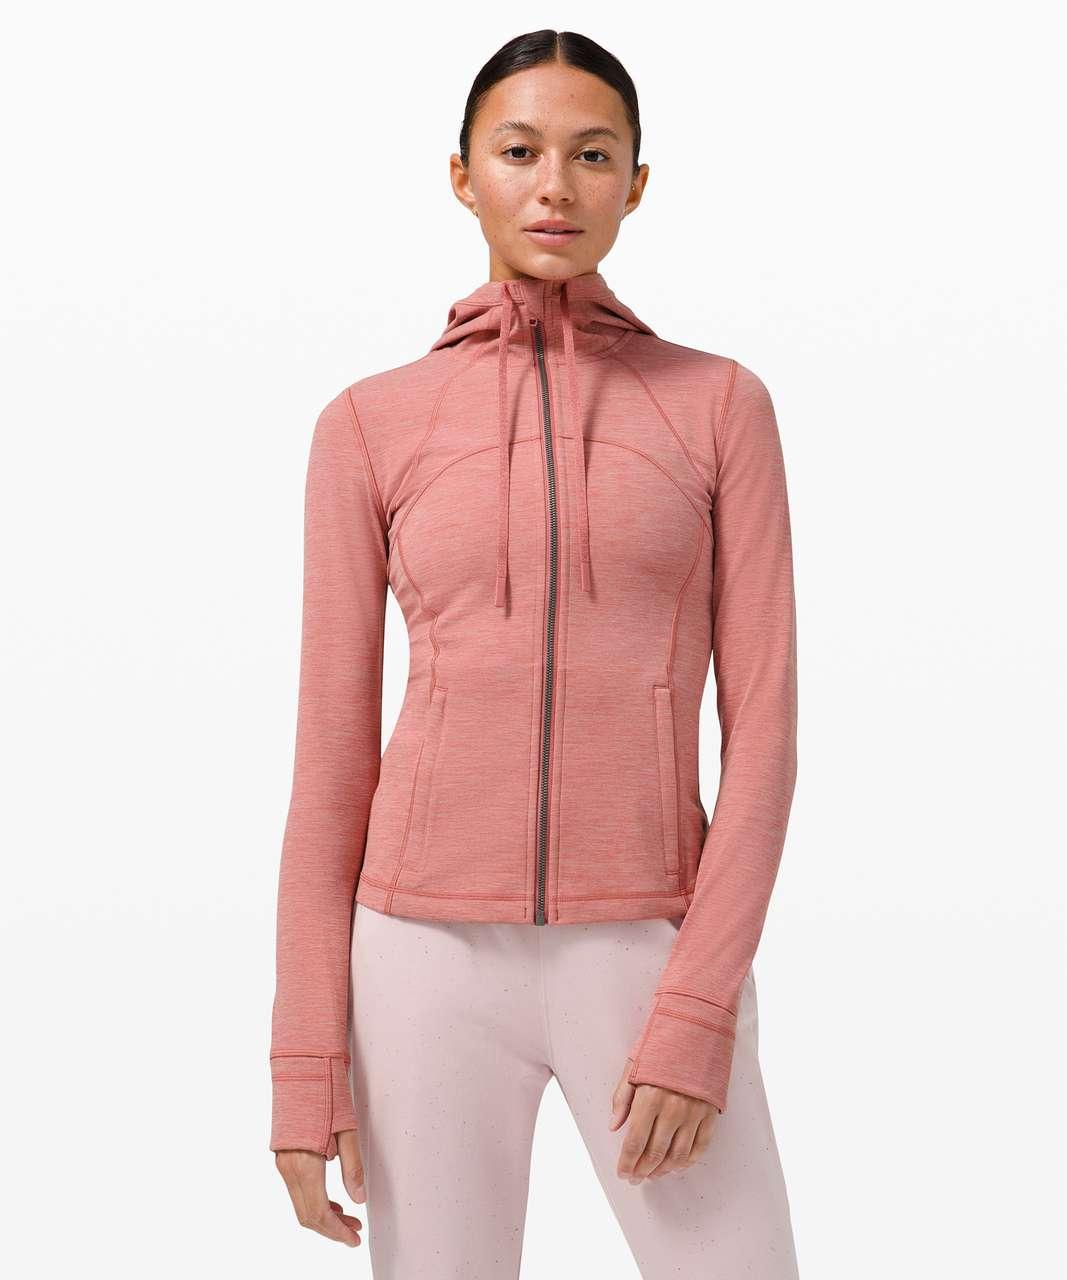 Lululemon Hooded Define Jacket *Nulu - Heathered Brier Rose